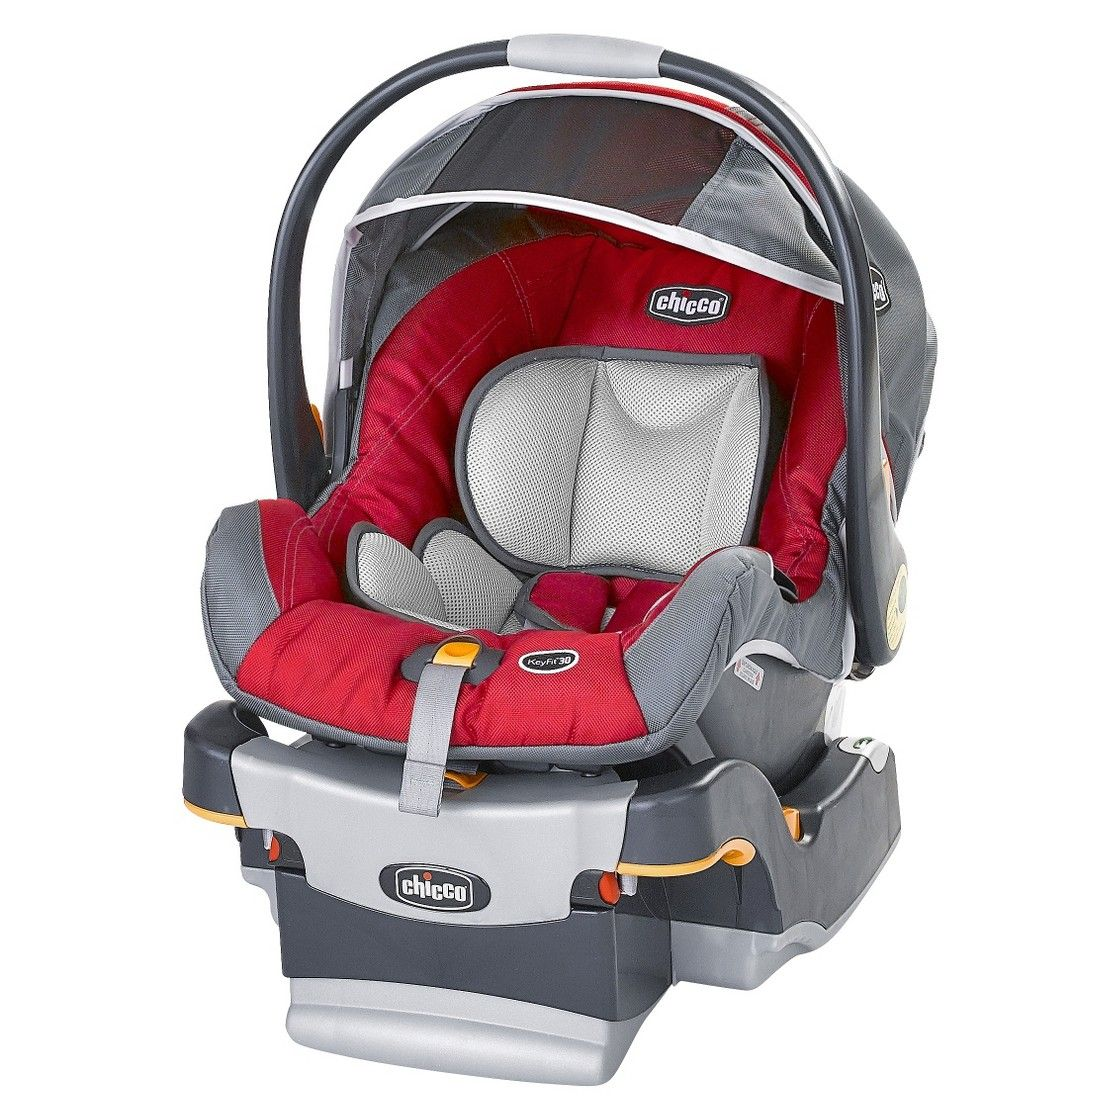 Chicco KeyFit 30 Infant Car Seat Baby car seats, Car